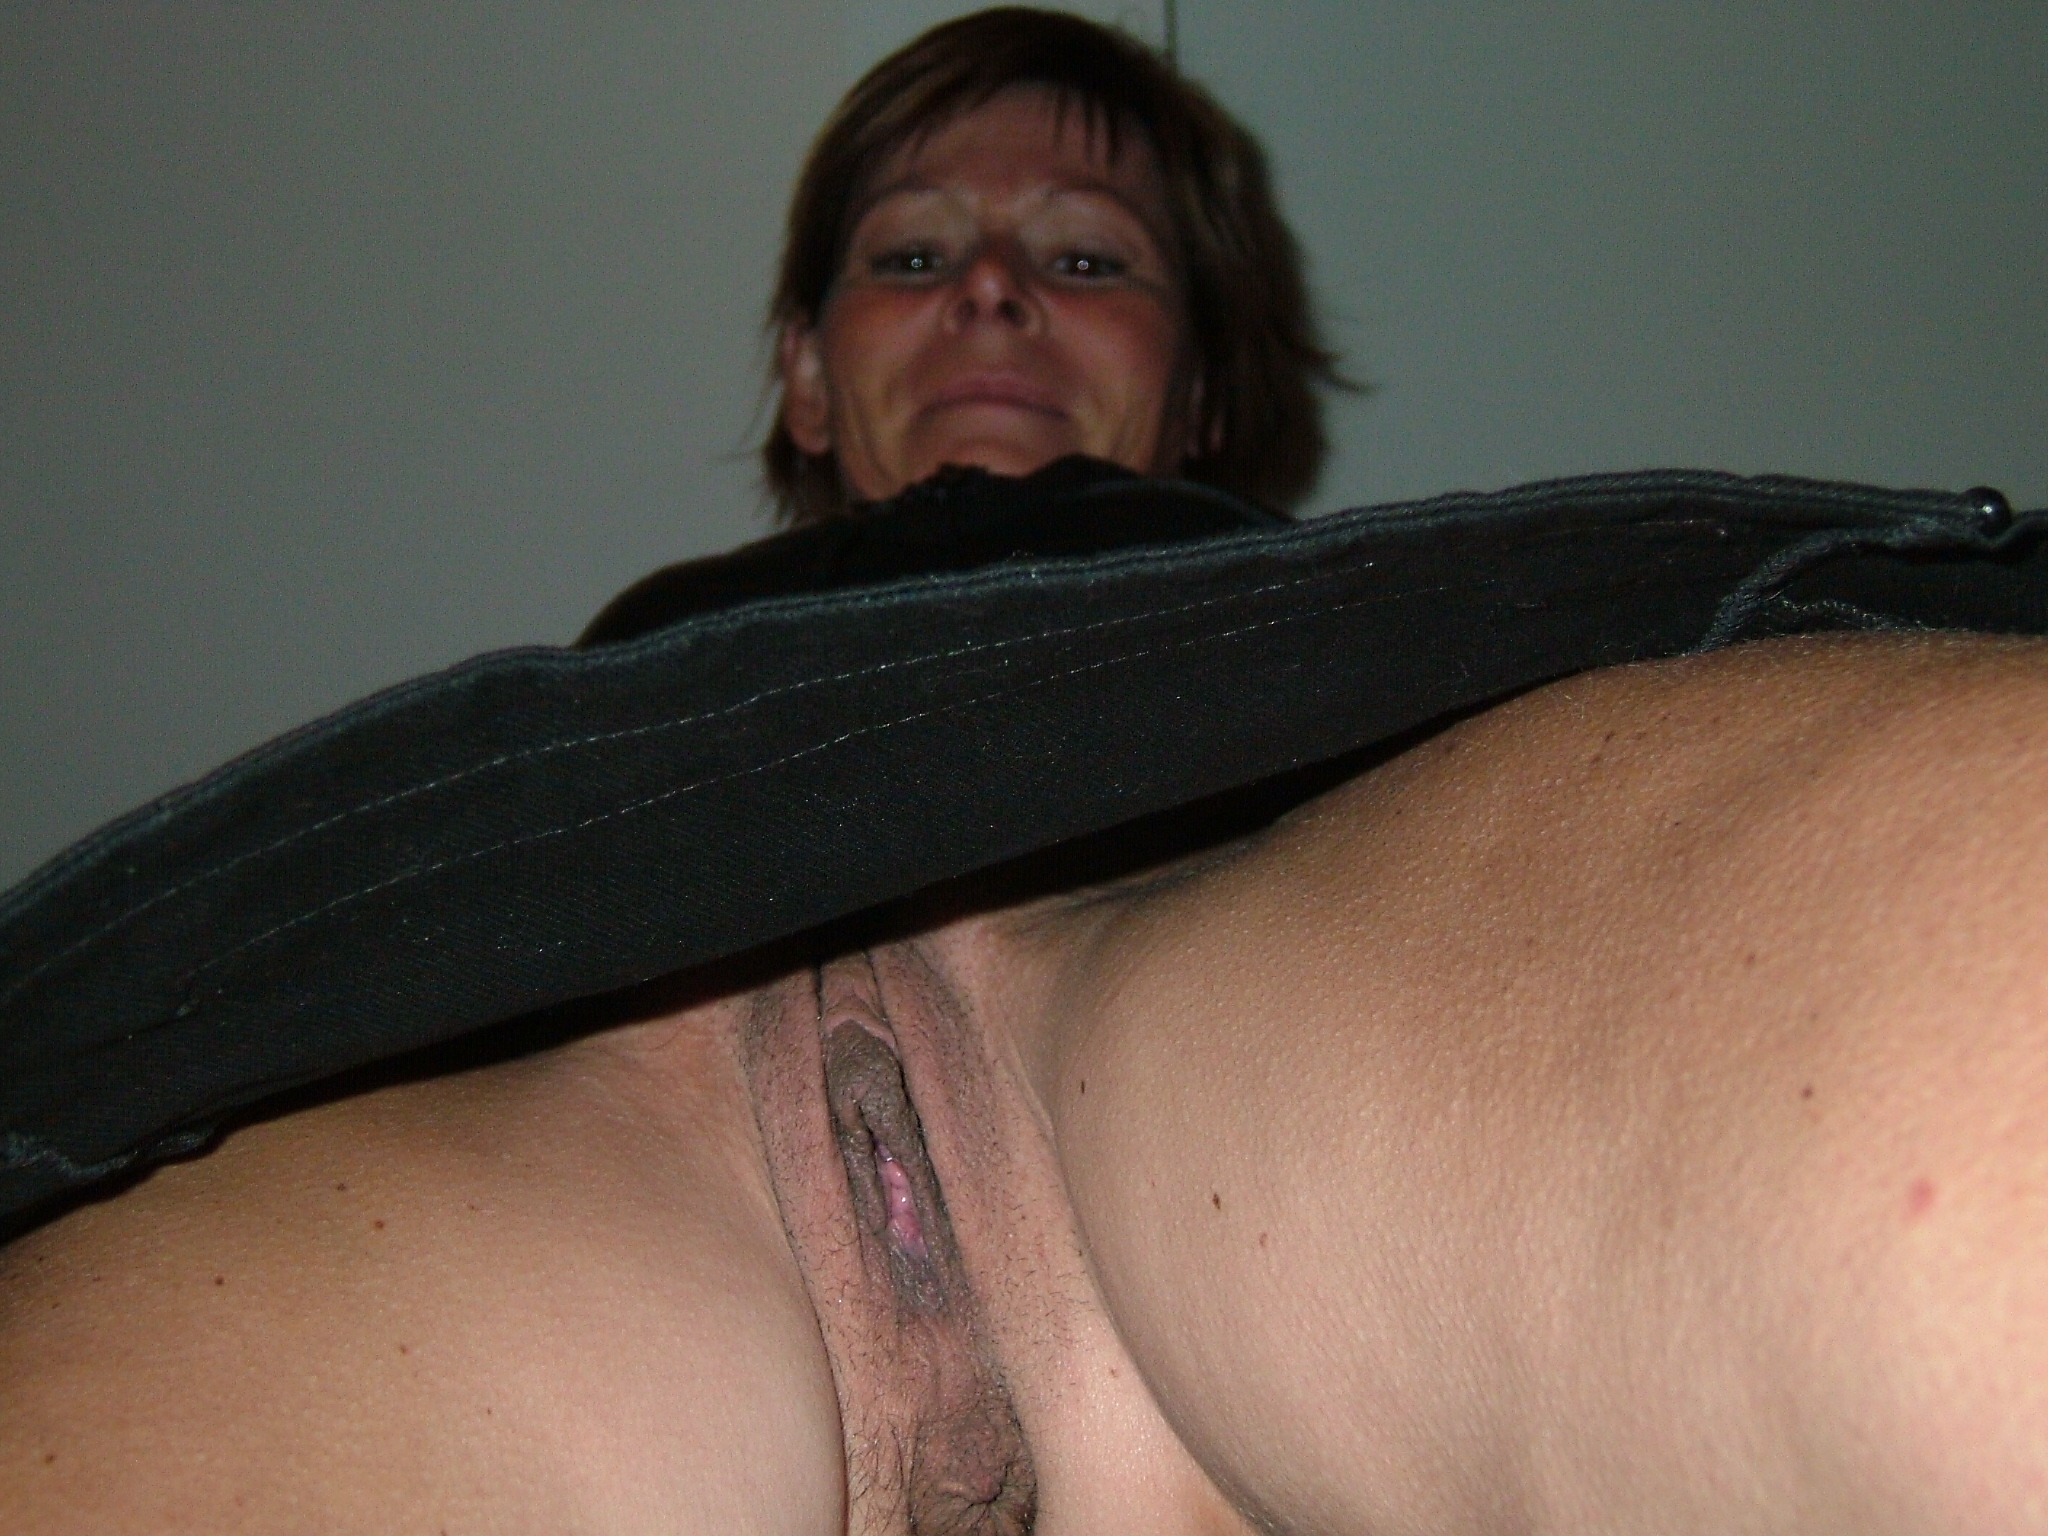 hardcore bondage yngre man äldre kvinna